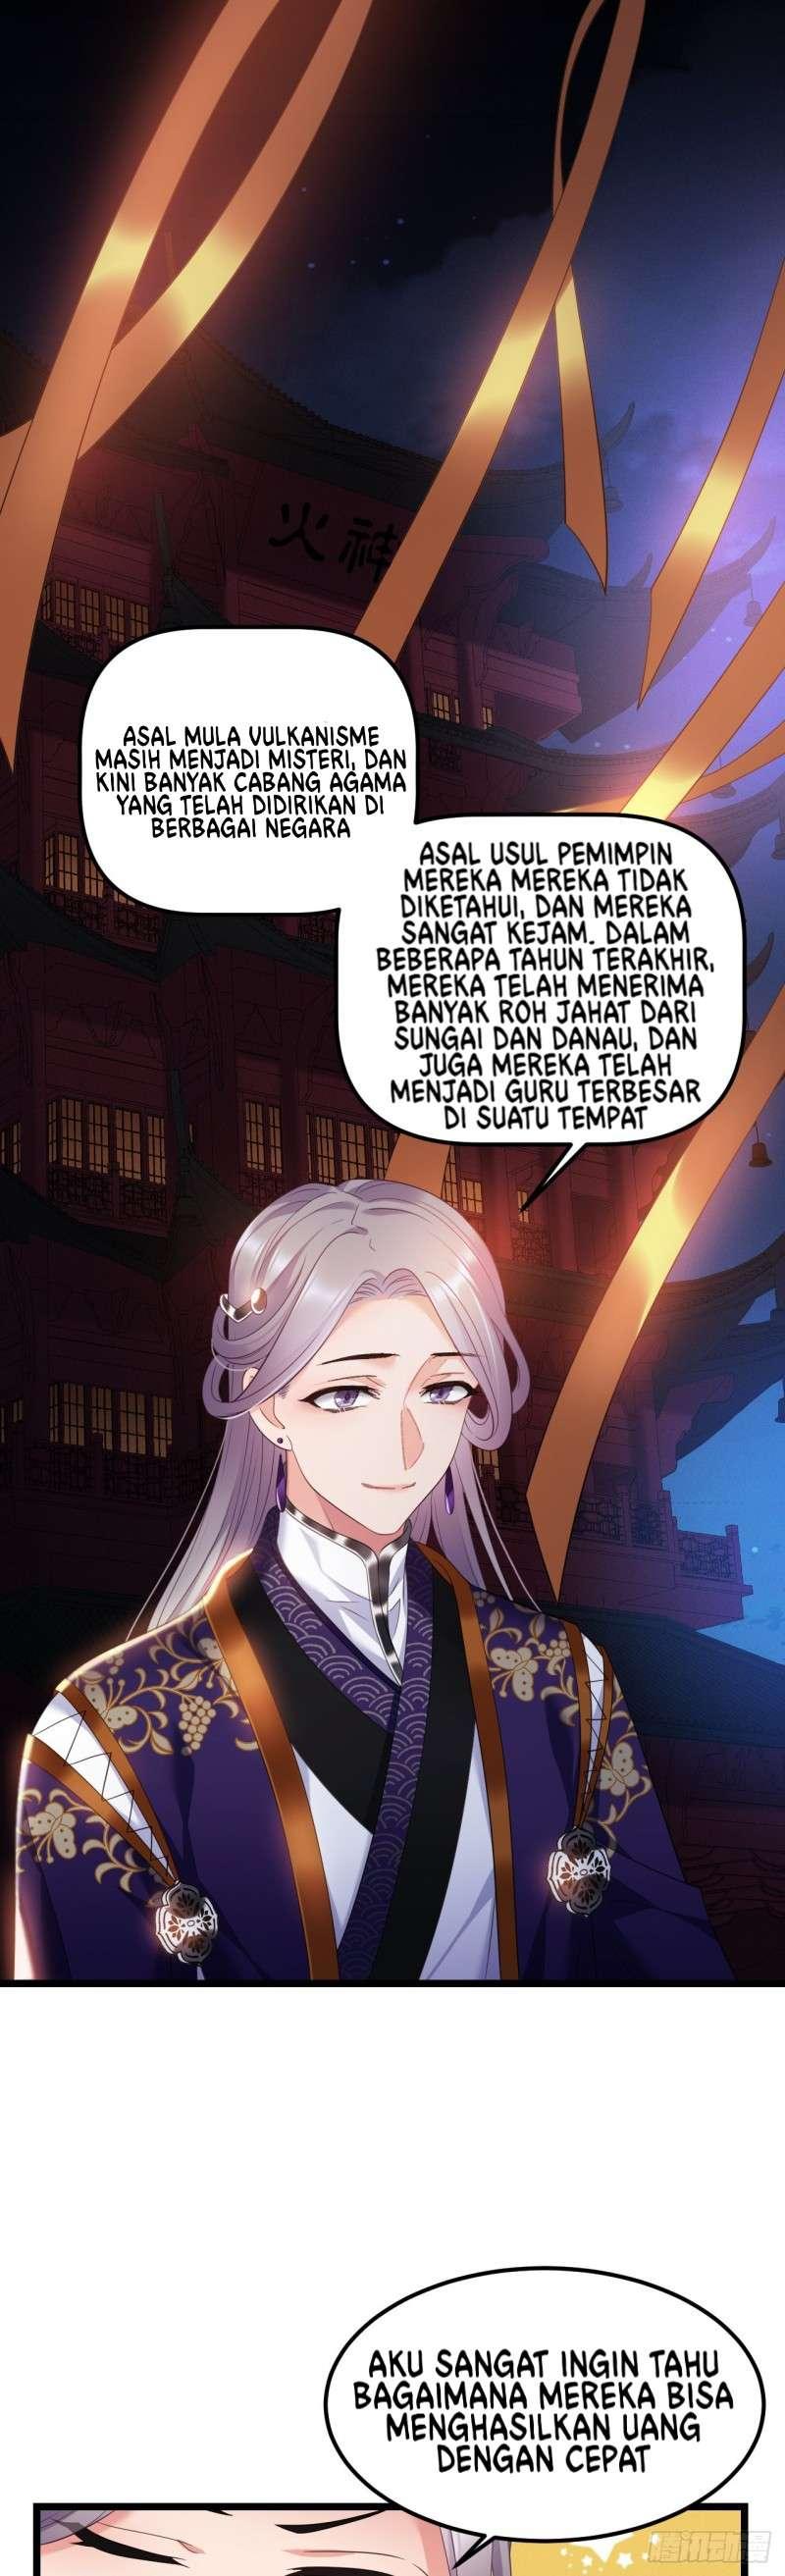 I Won't Marry The Enemy Prince Chapter 41 - Komik Terbaru